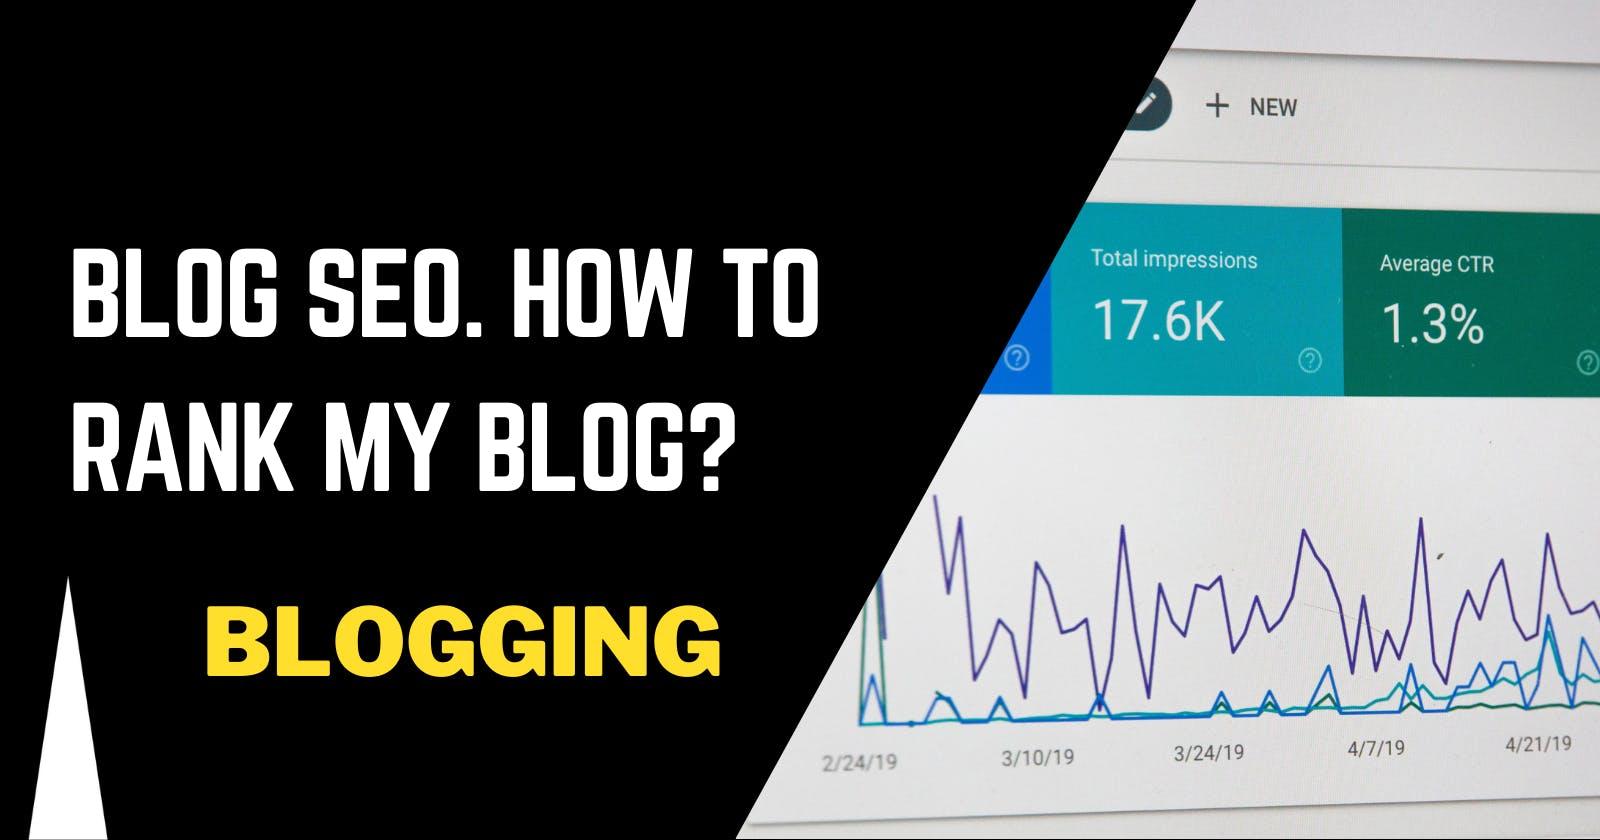 Dev Blog SEO. How to rank my blog? Should I cross-post?